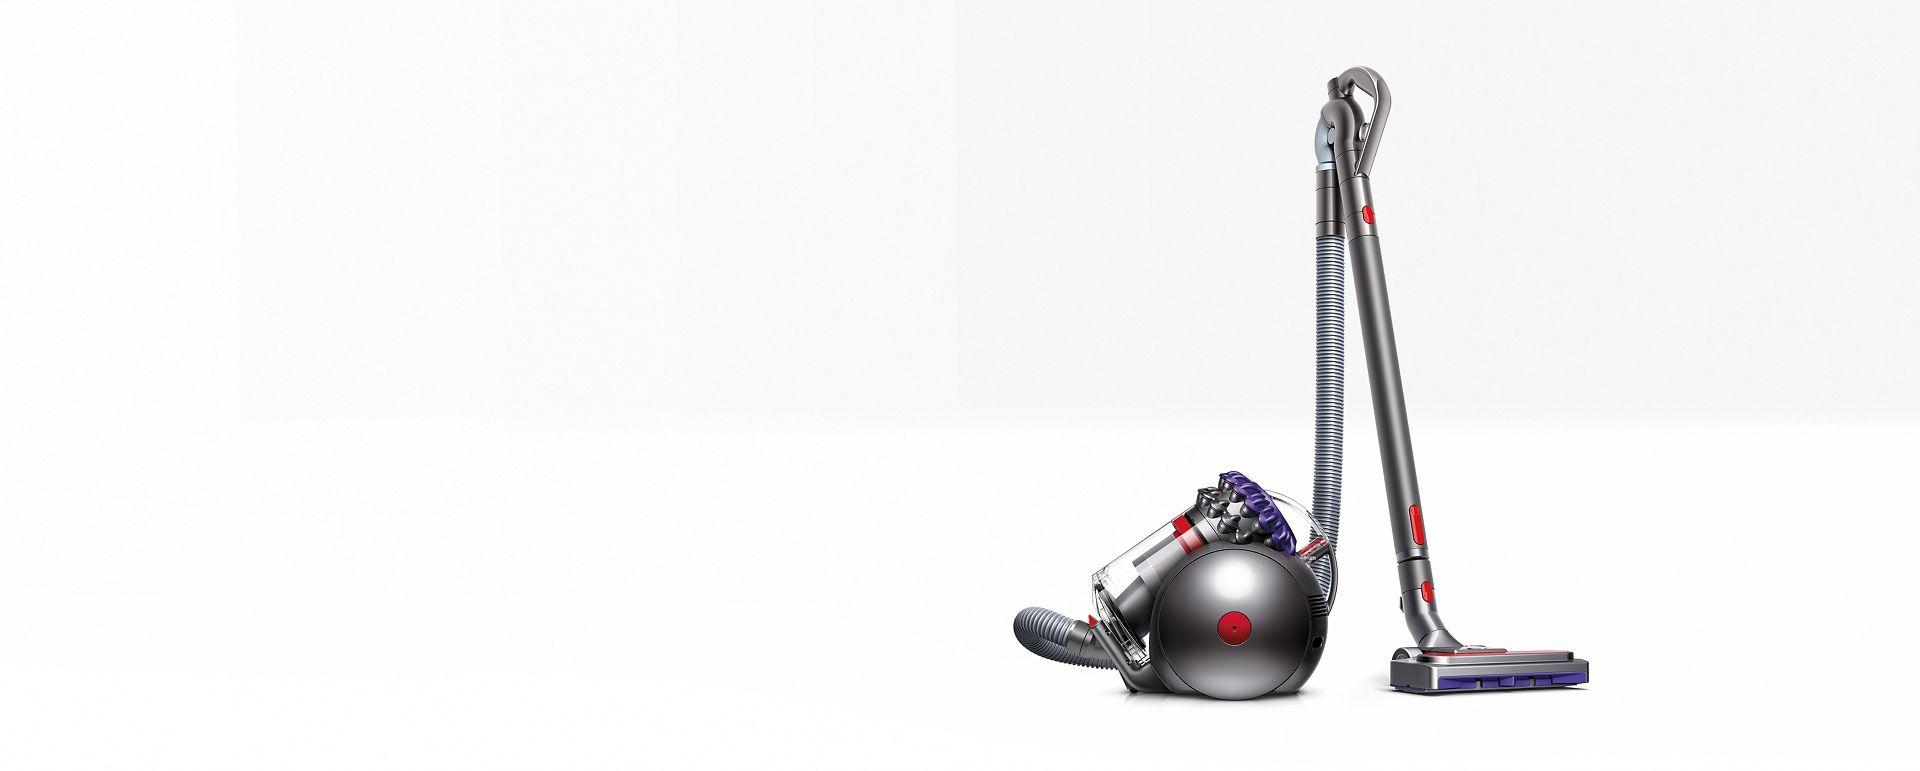 Dyson Big Ball Animal 2 vacuum